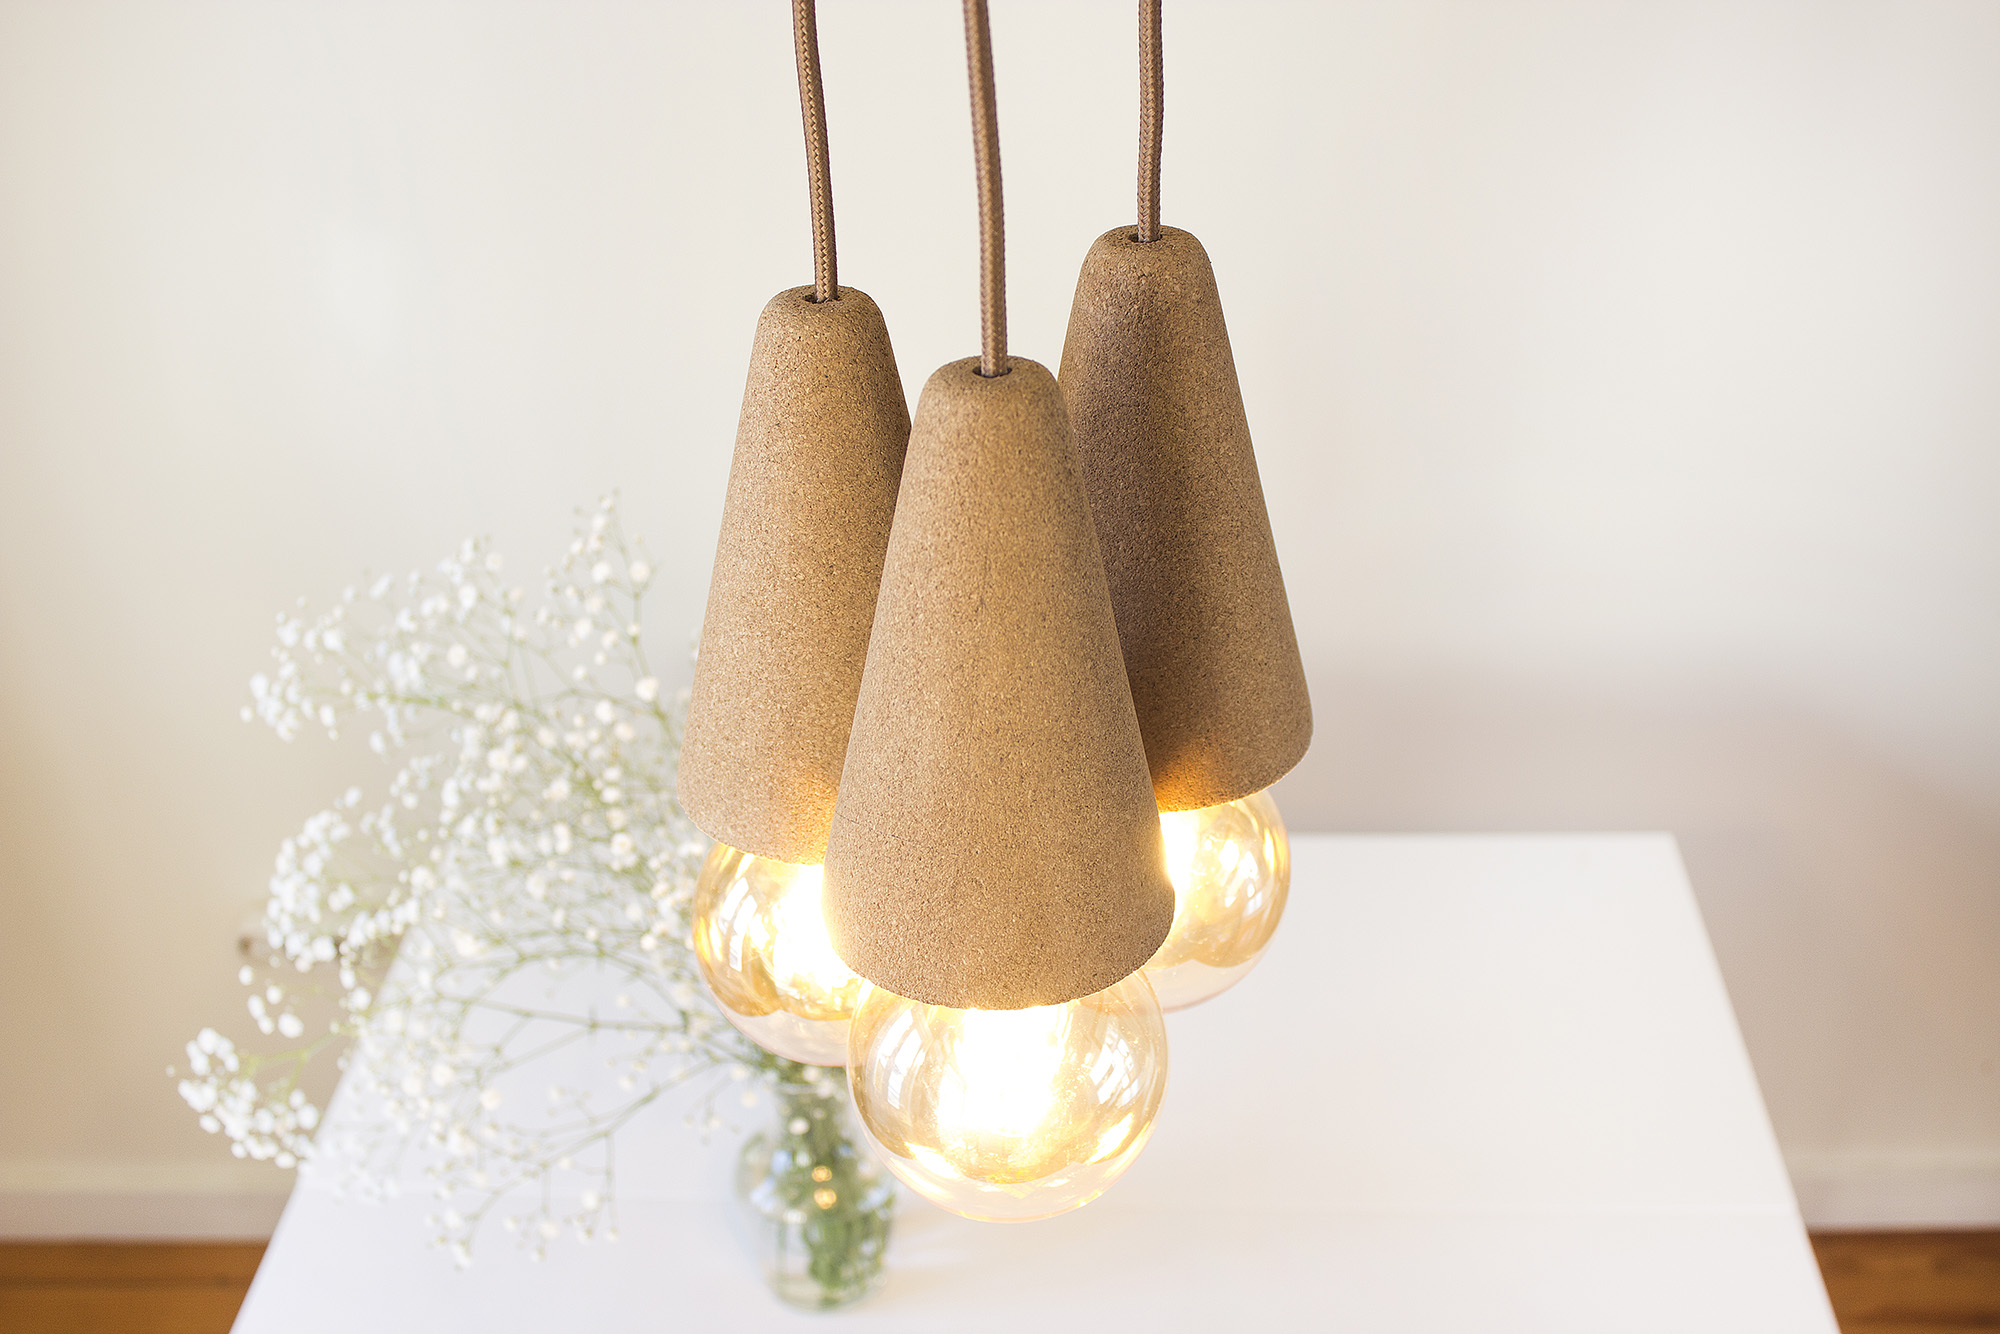 low-Galula-Sino-lamp-light-cork-triple-amb-1.jpg